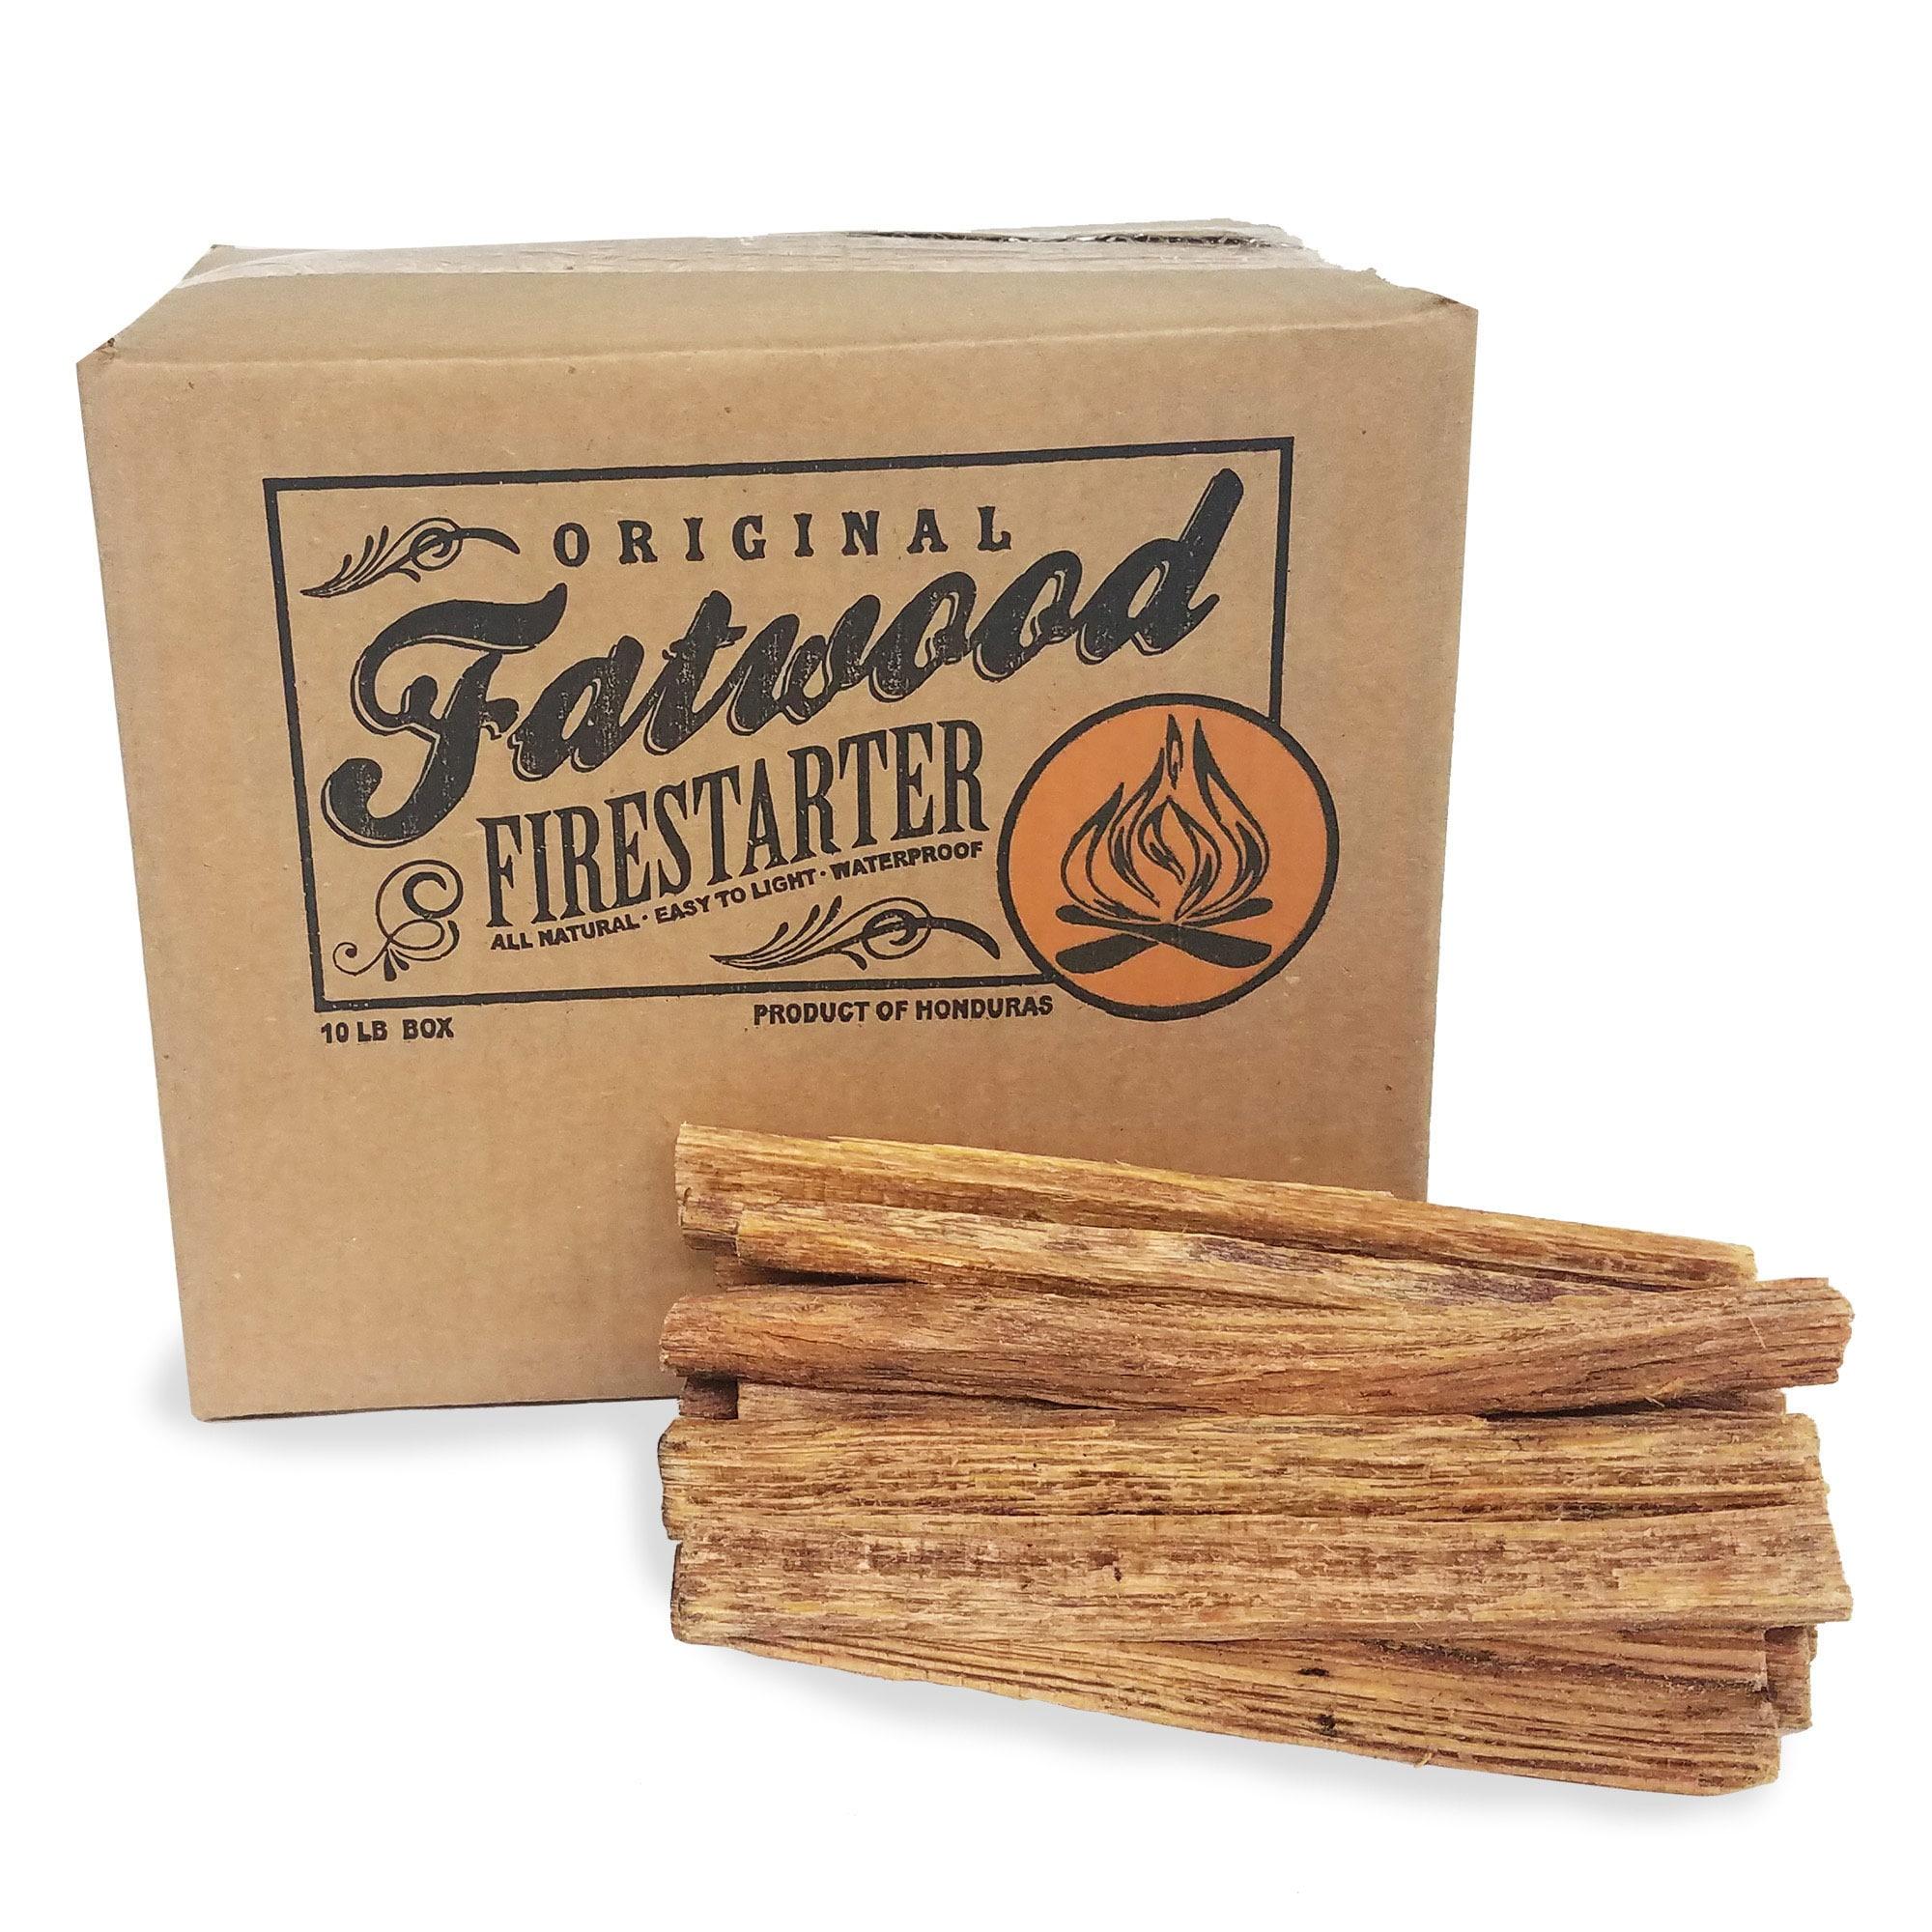 Fatwood Firestarter Kindling Sticks – Quickstart Tinder b...